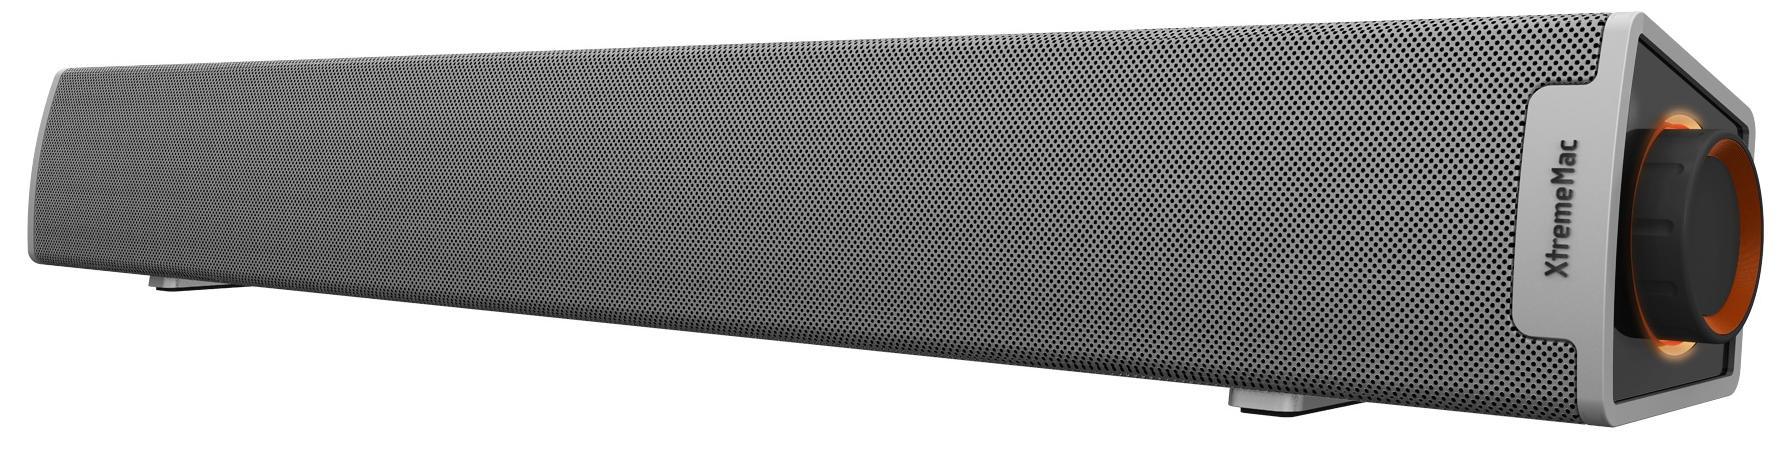 Саундбар XtremeMac Tango Sound Bar USB-B22-03 (Silver)